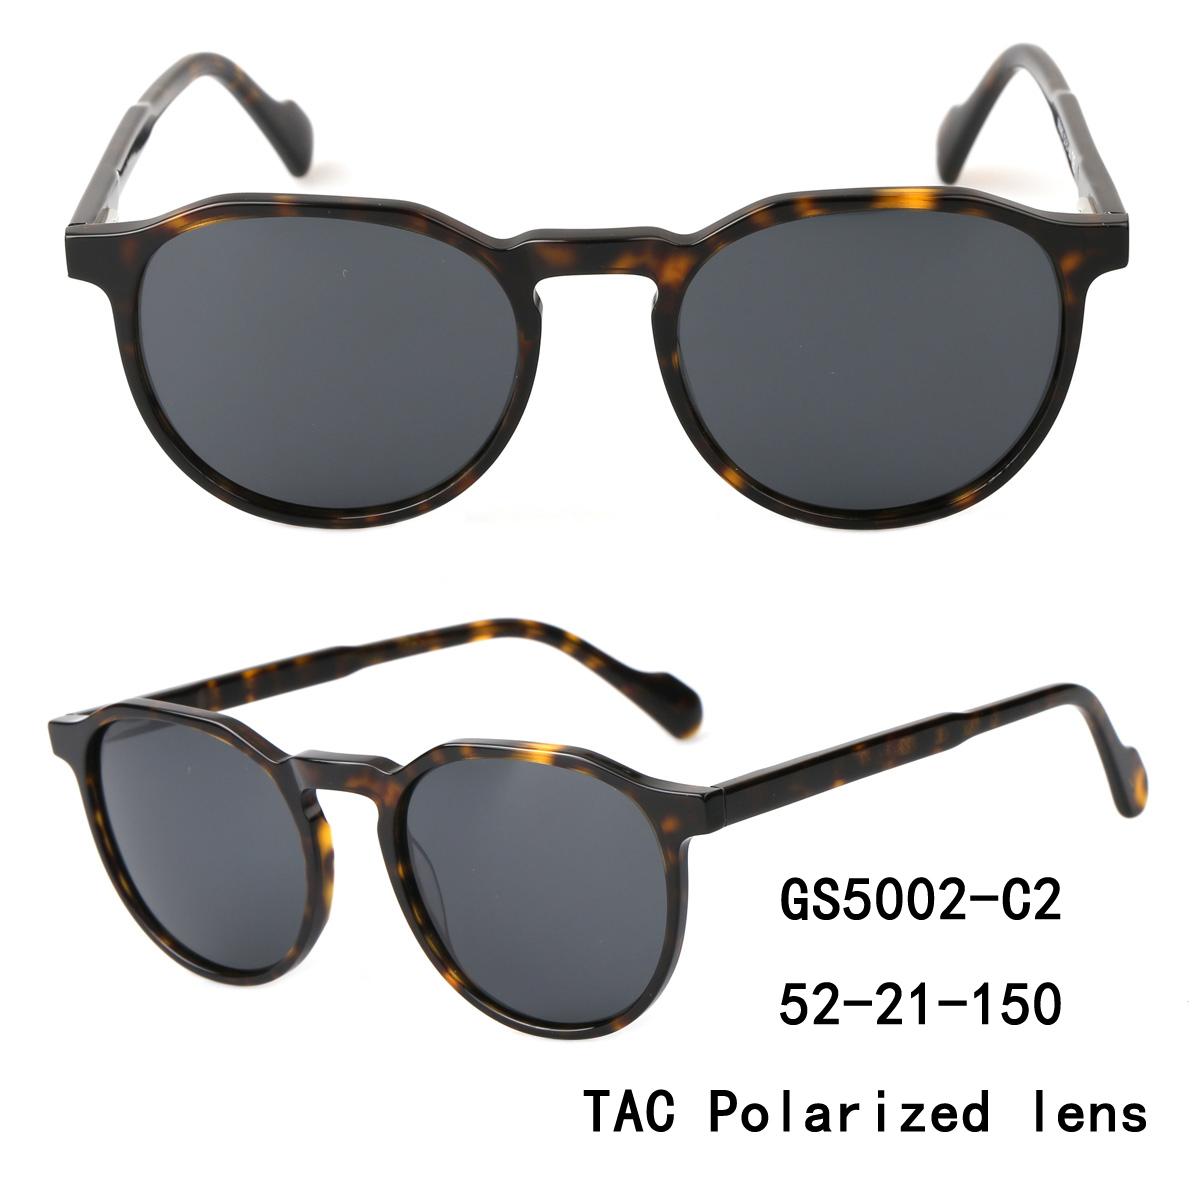 Buy Cheap Classic Acetate Sunglasses-Popeyewear Private Label